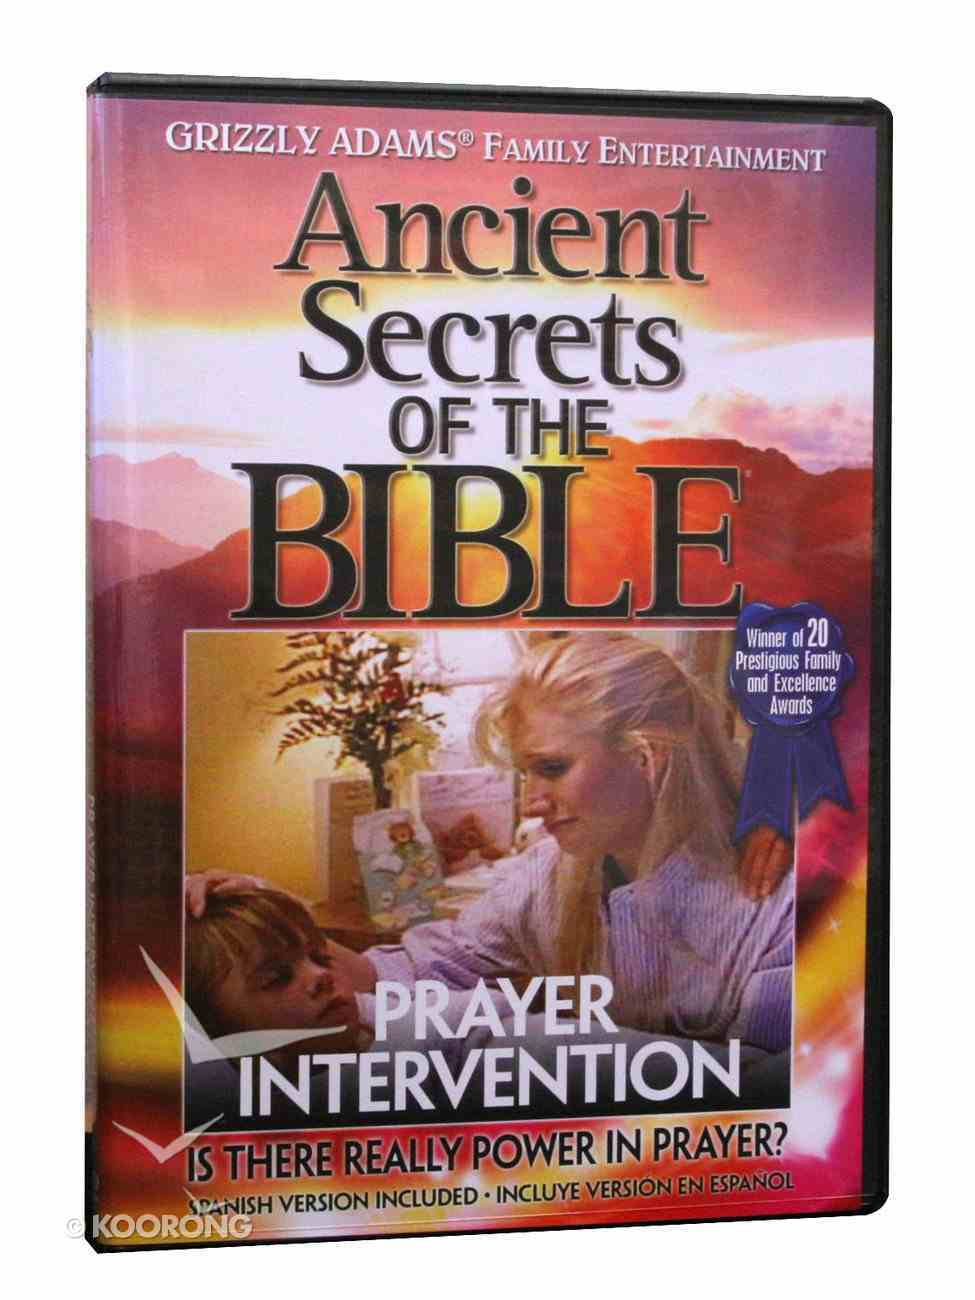 Ancient Secrets 2 #09: Prayer Intervention (Ancient Secrets Of The Bible Dvd Series) DVD